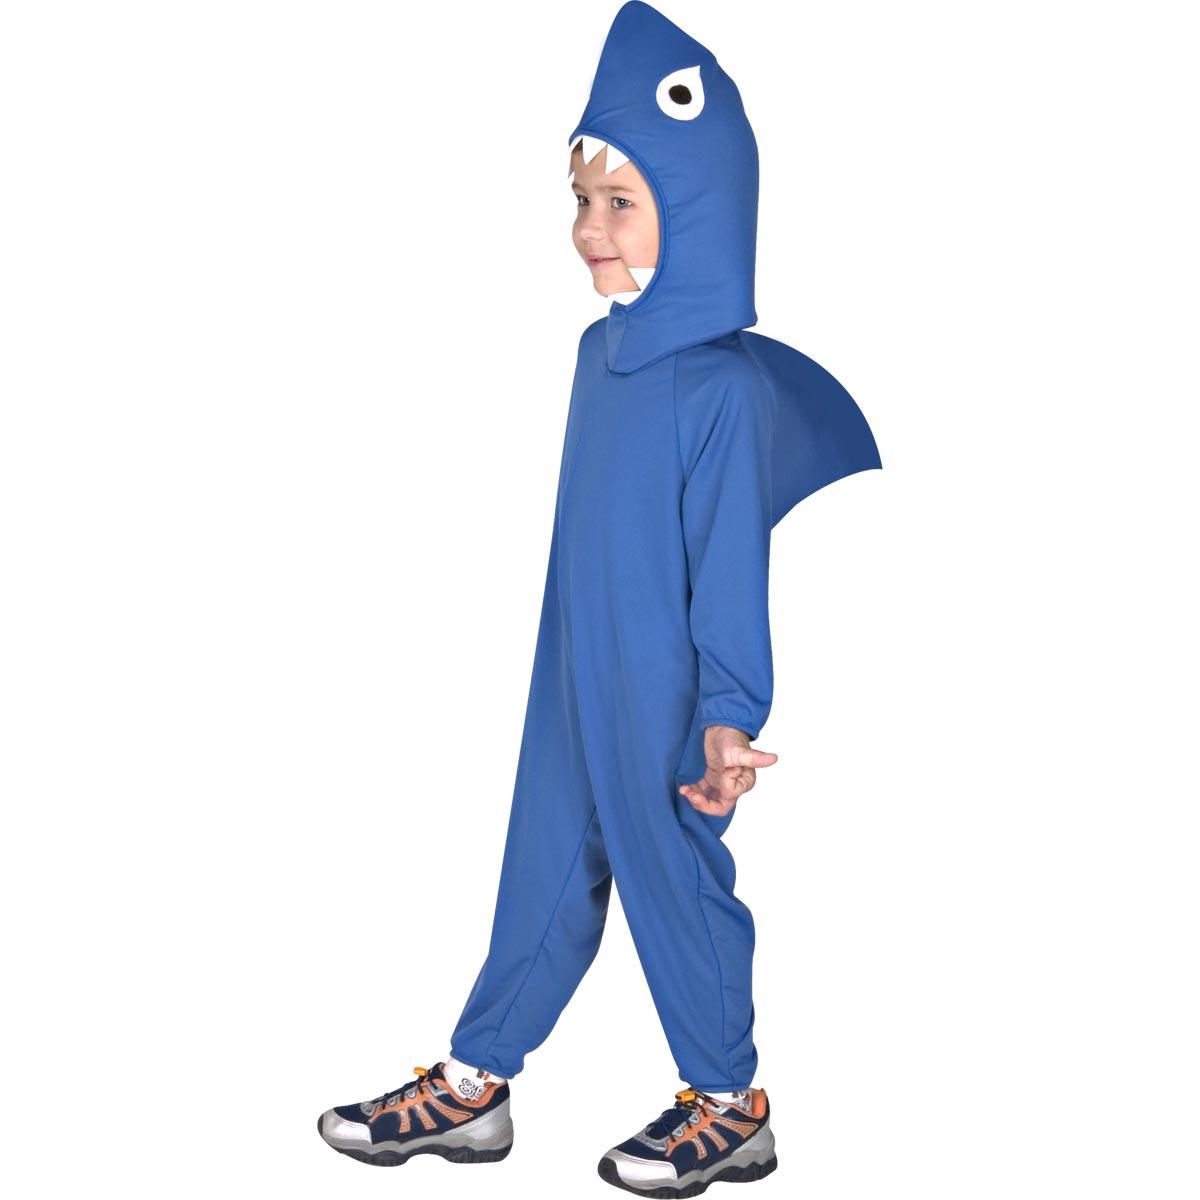 Fantasia Tubarão Unissex Infantil